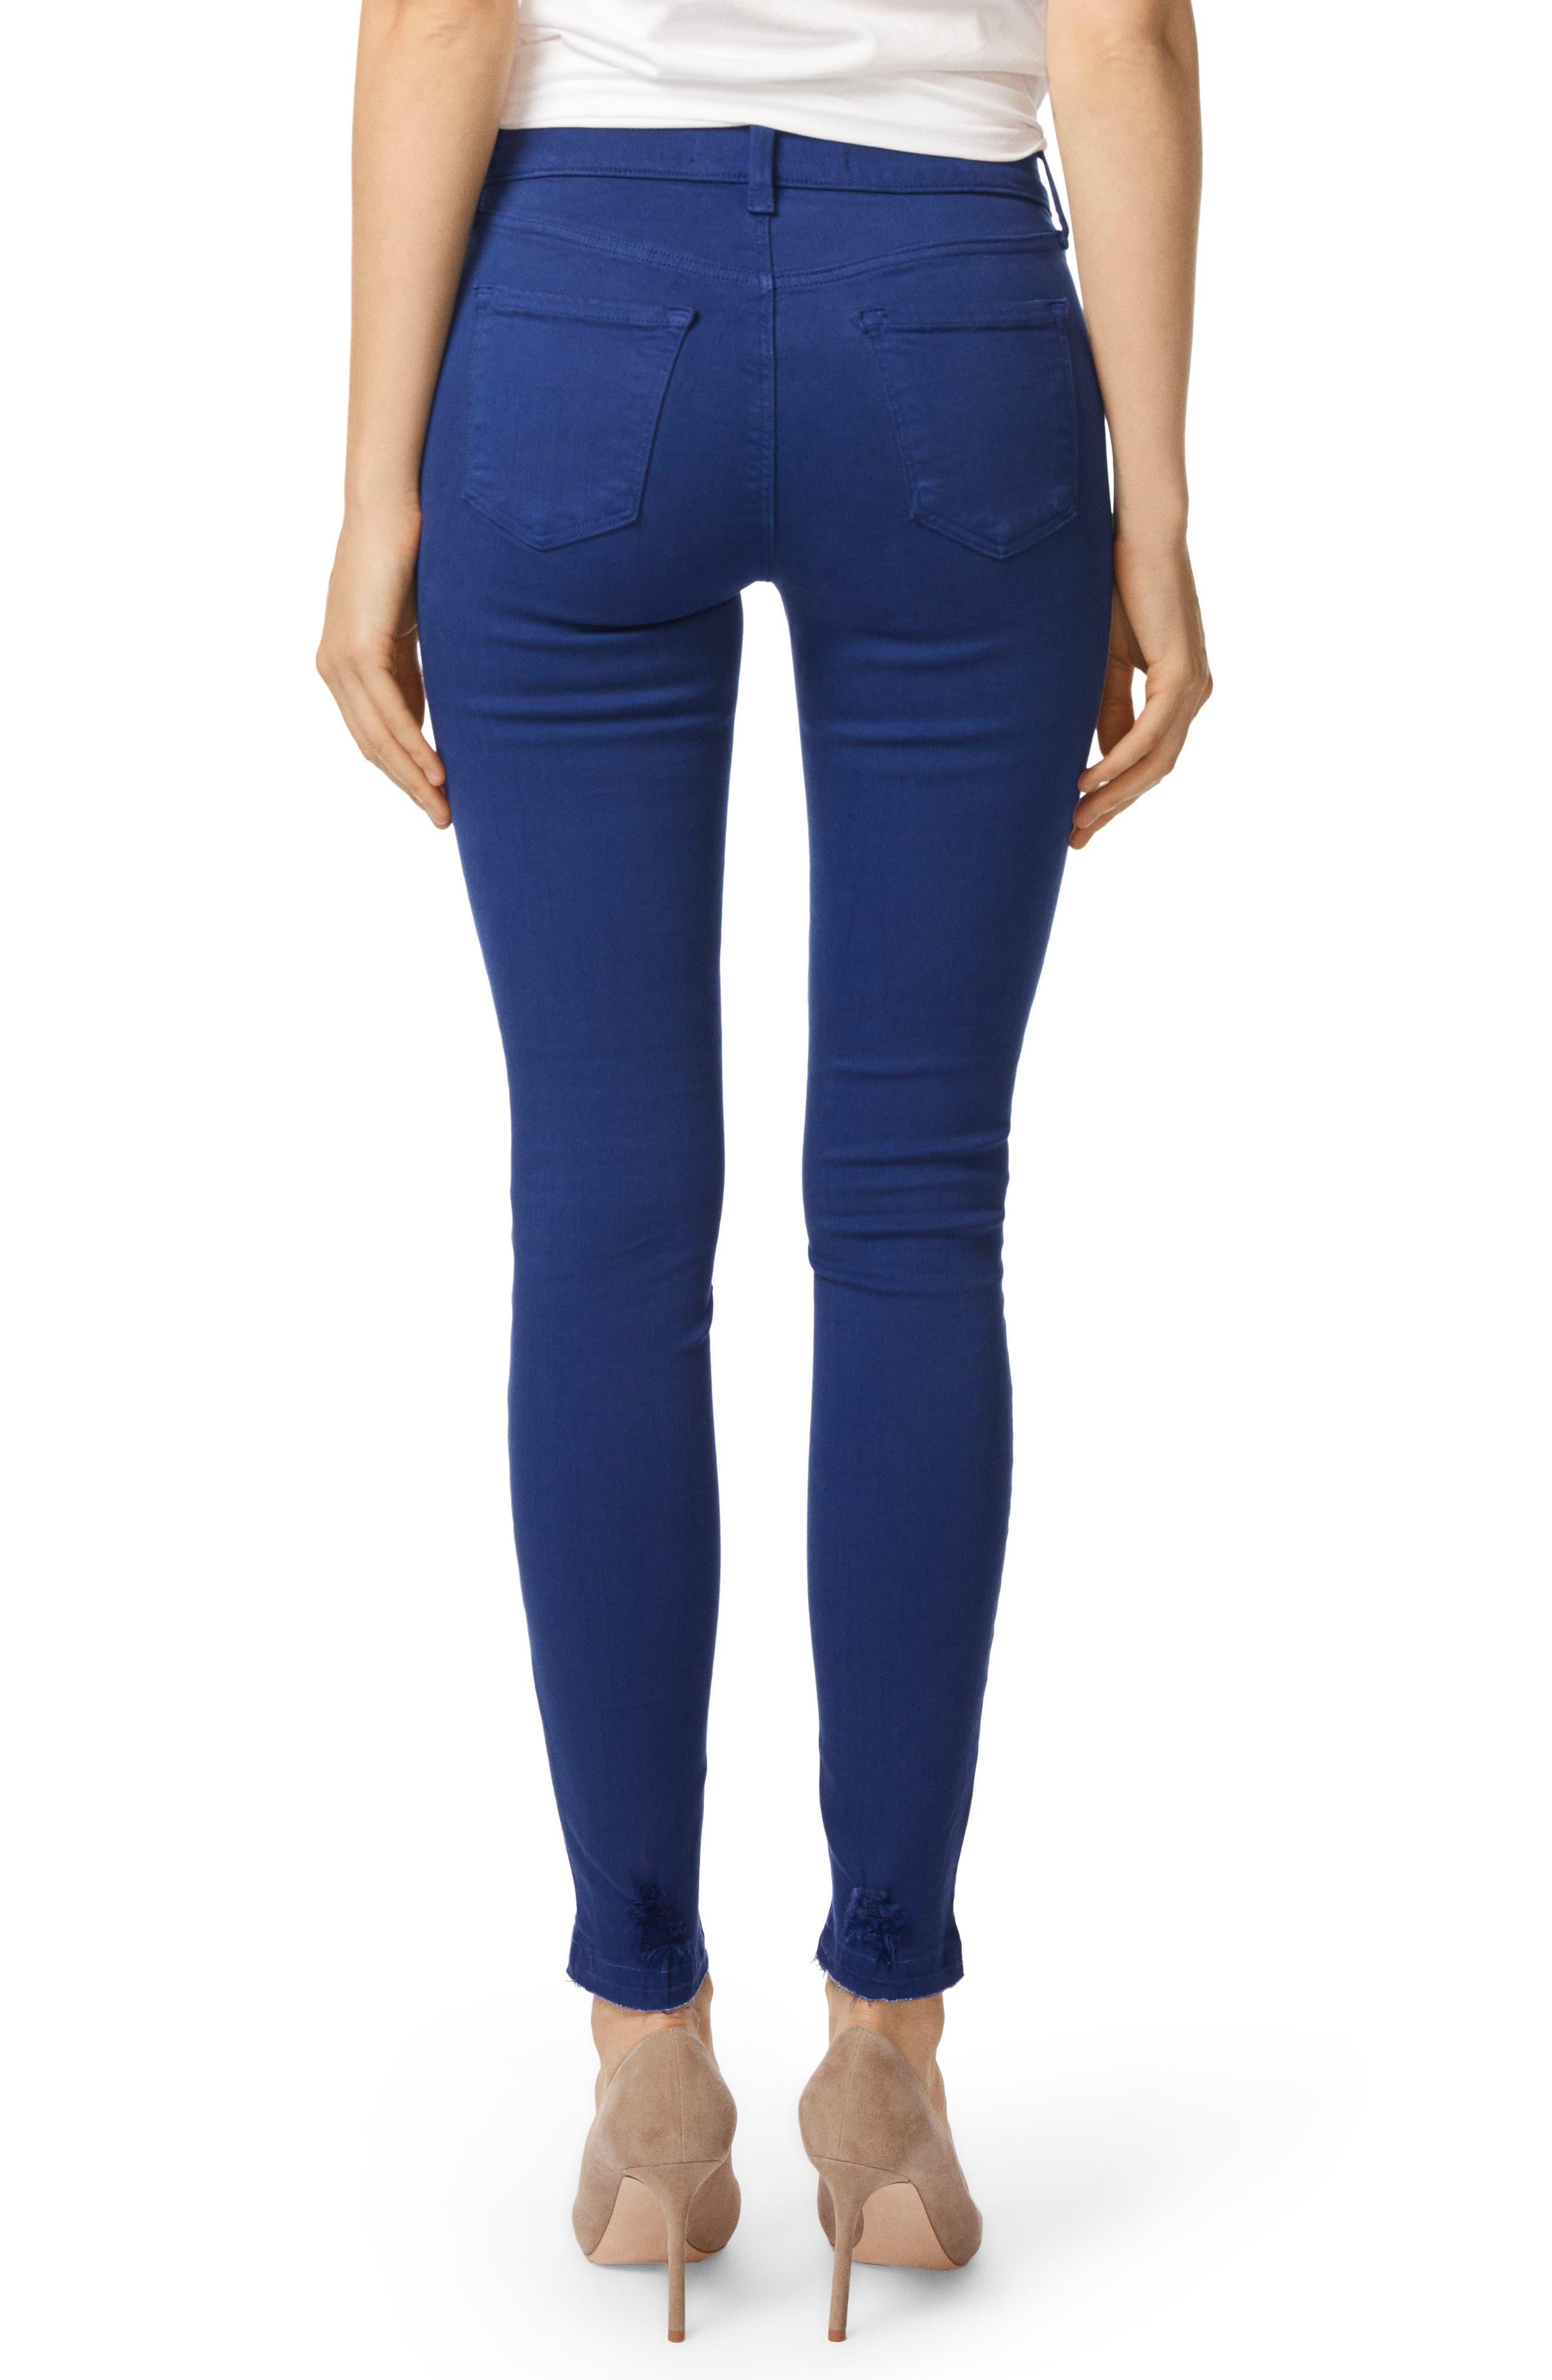 620 Mid Rise Super Skinny Jeans,                             Alternate thumbnail 2, color,                             Electric Sea Destruct